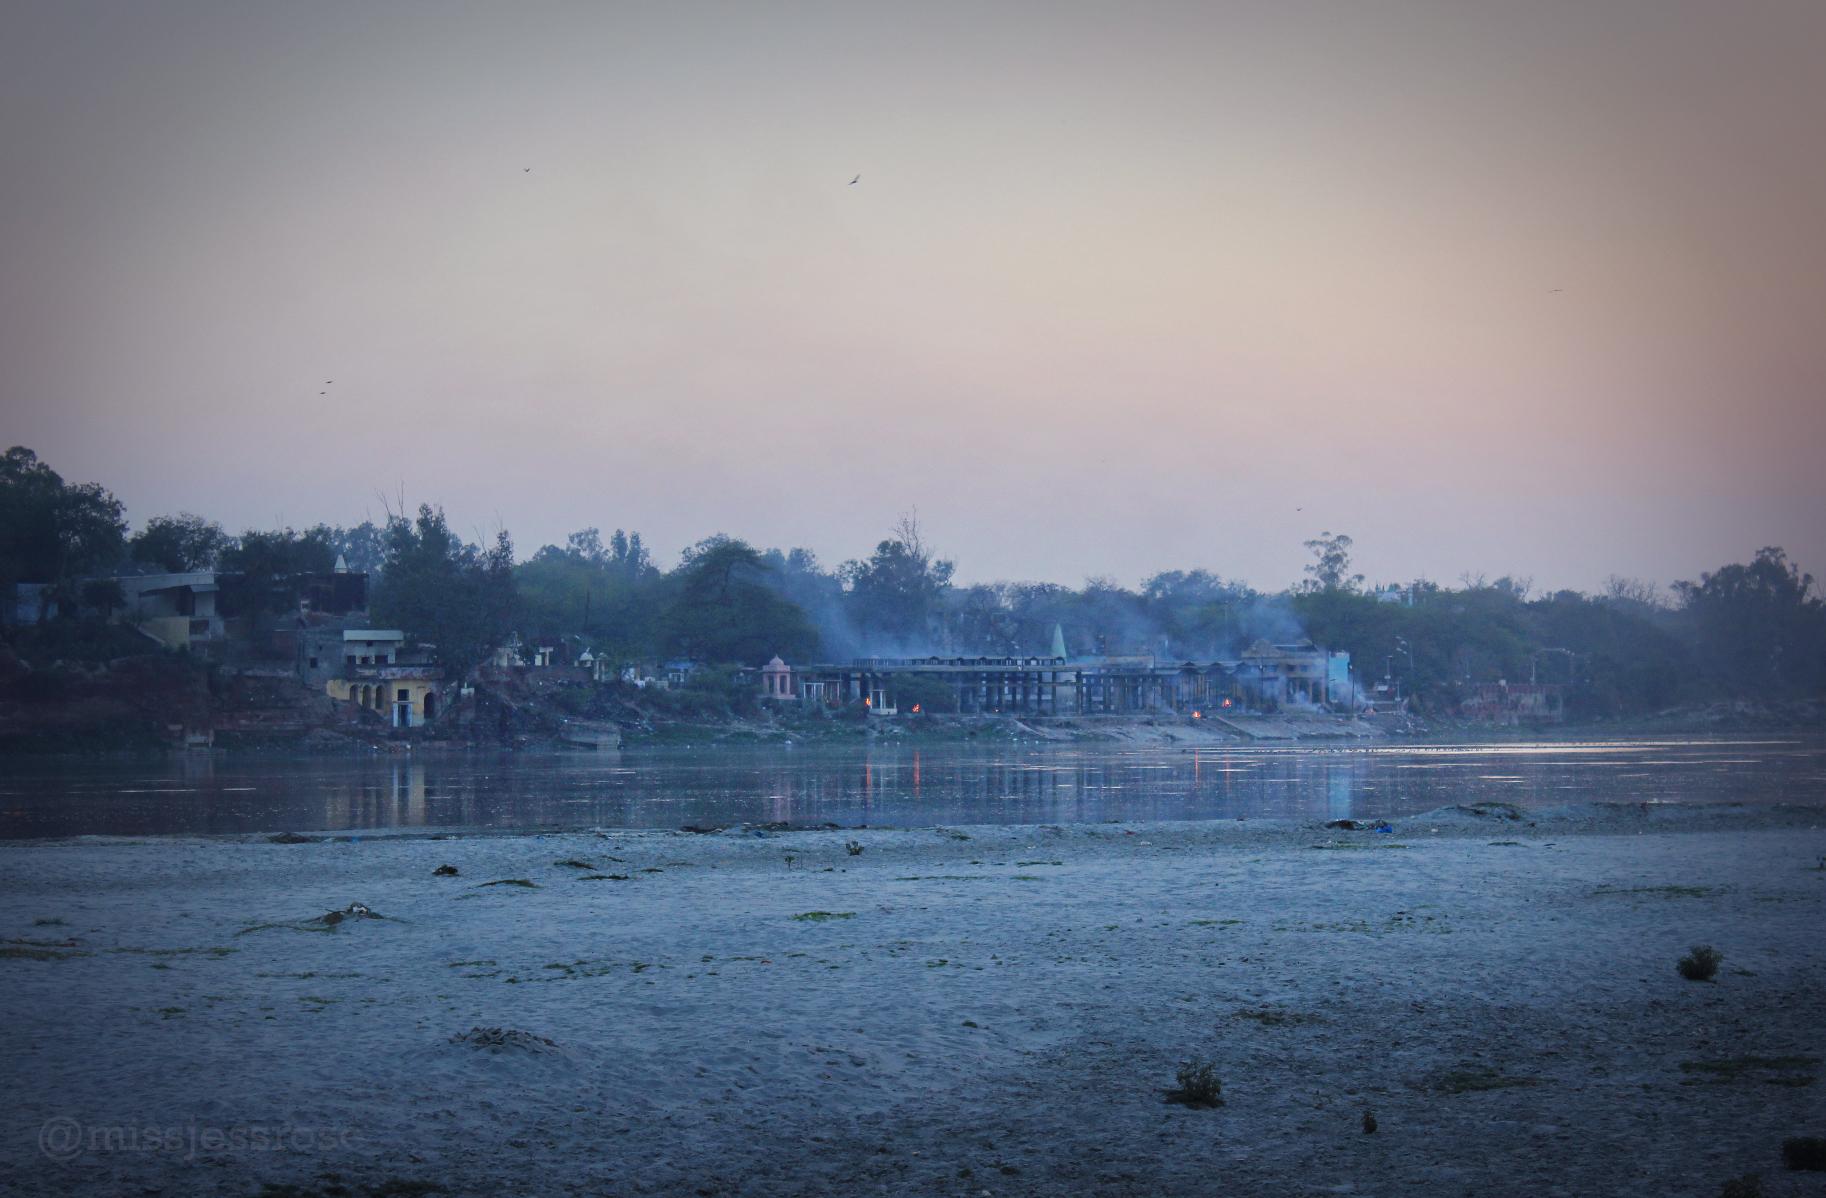 Fires burning alongside the Yamuna river near the Taj at dusk